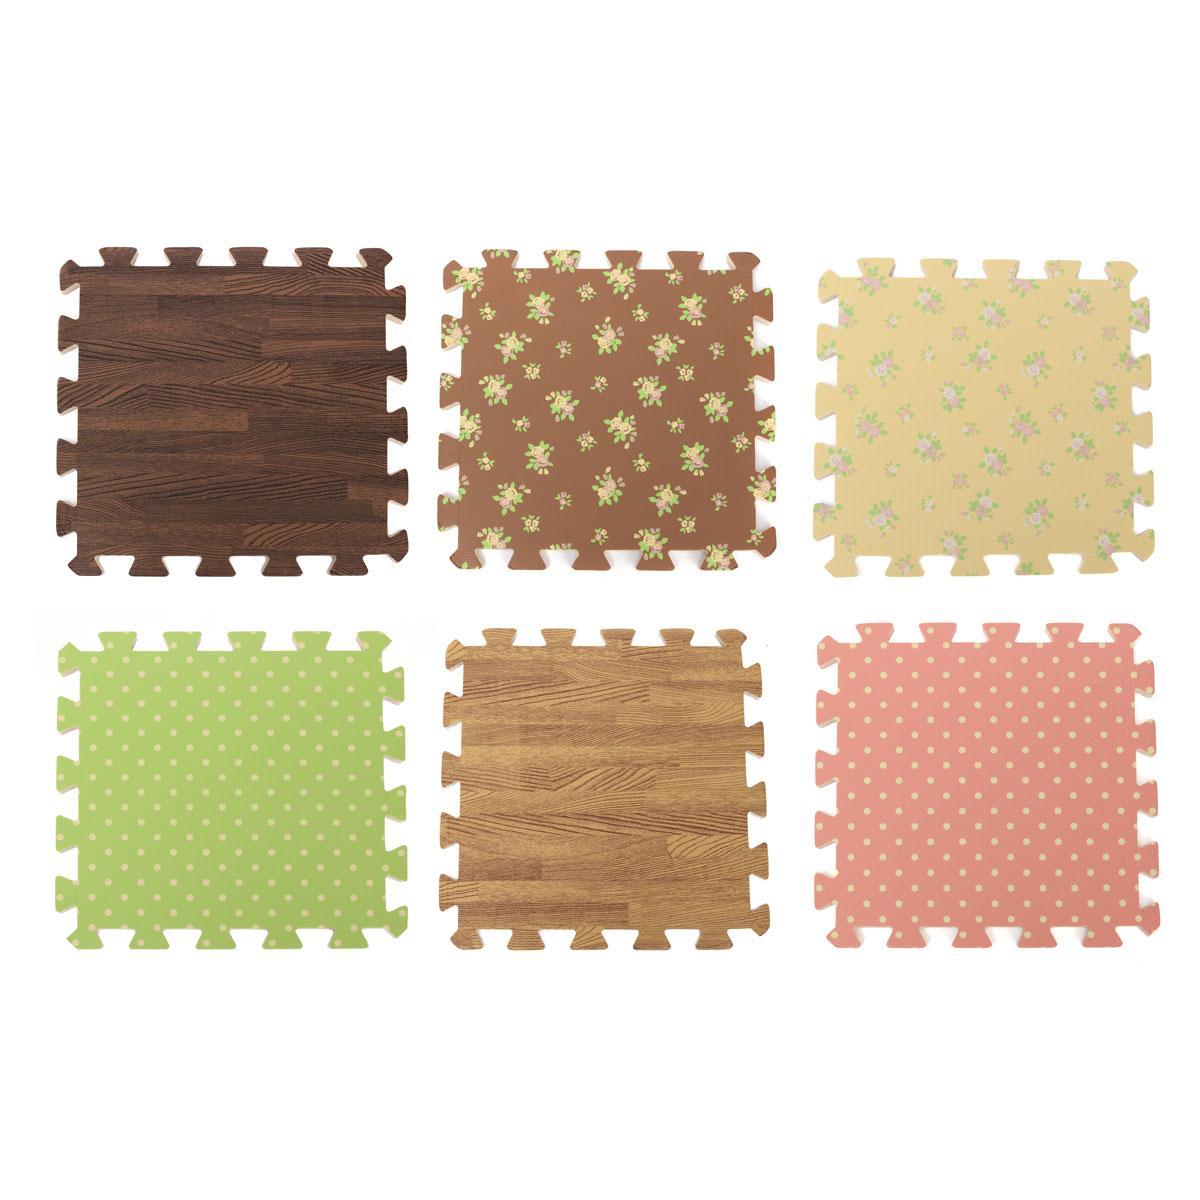 Floor mats for kids - 9pcs Bag Baby Play Mat Floor Puzzle Mats Kids Children Foam Carpet Mosaic Floor For